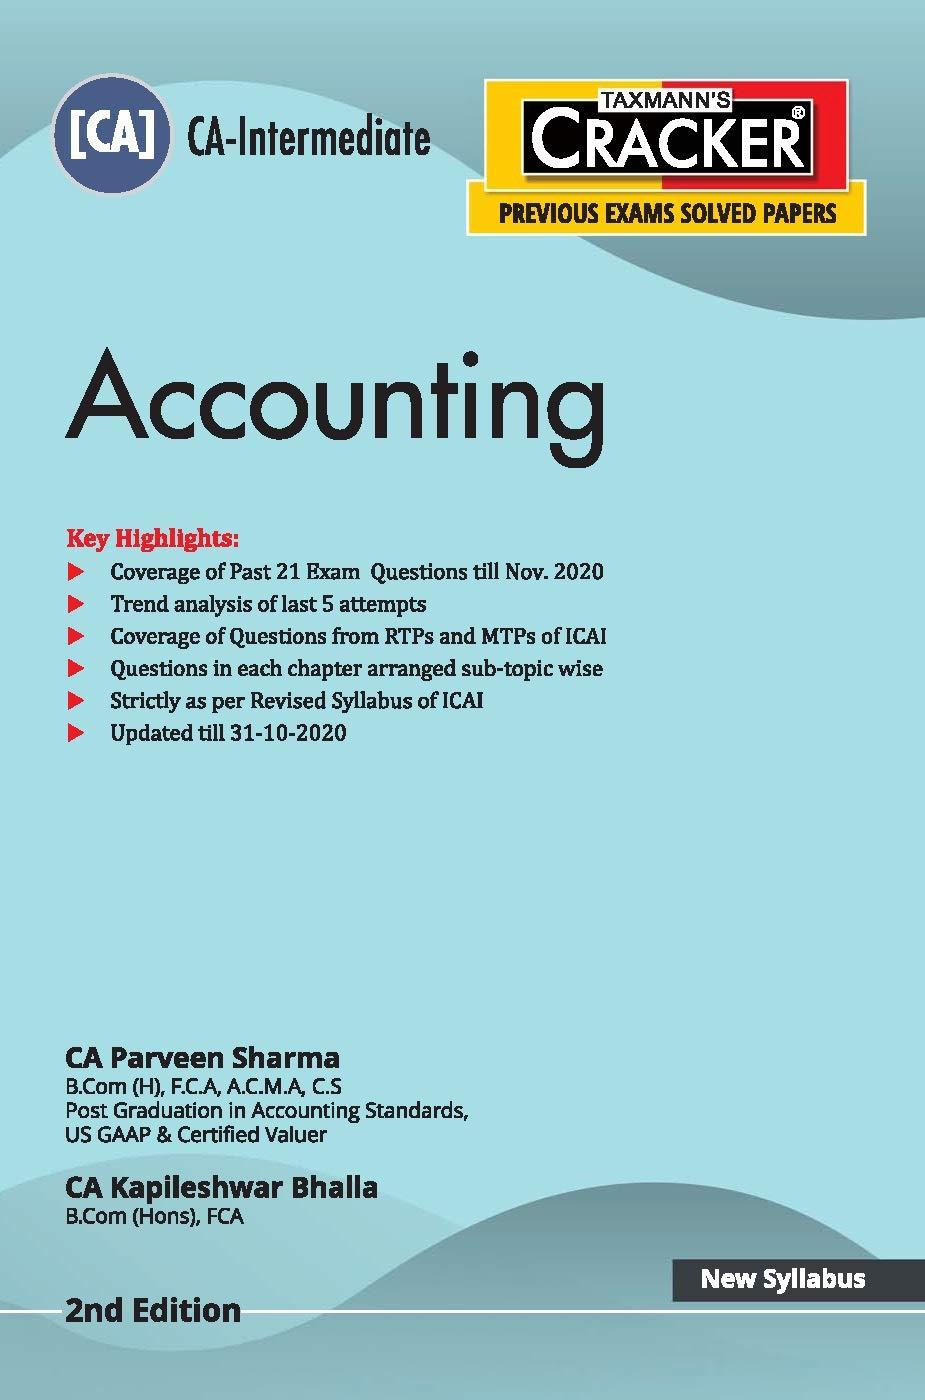 Taxmann's CRACKER – Accounting | CA-Intermediate – New Syllabus | Updated till 31-10-2020 | 2nd Edition